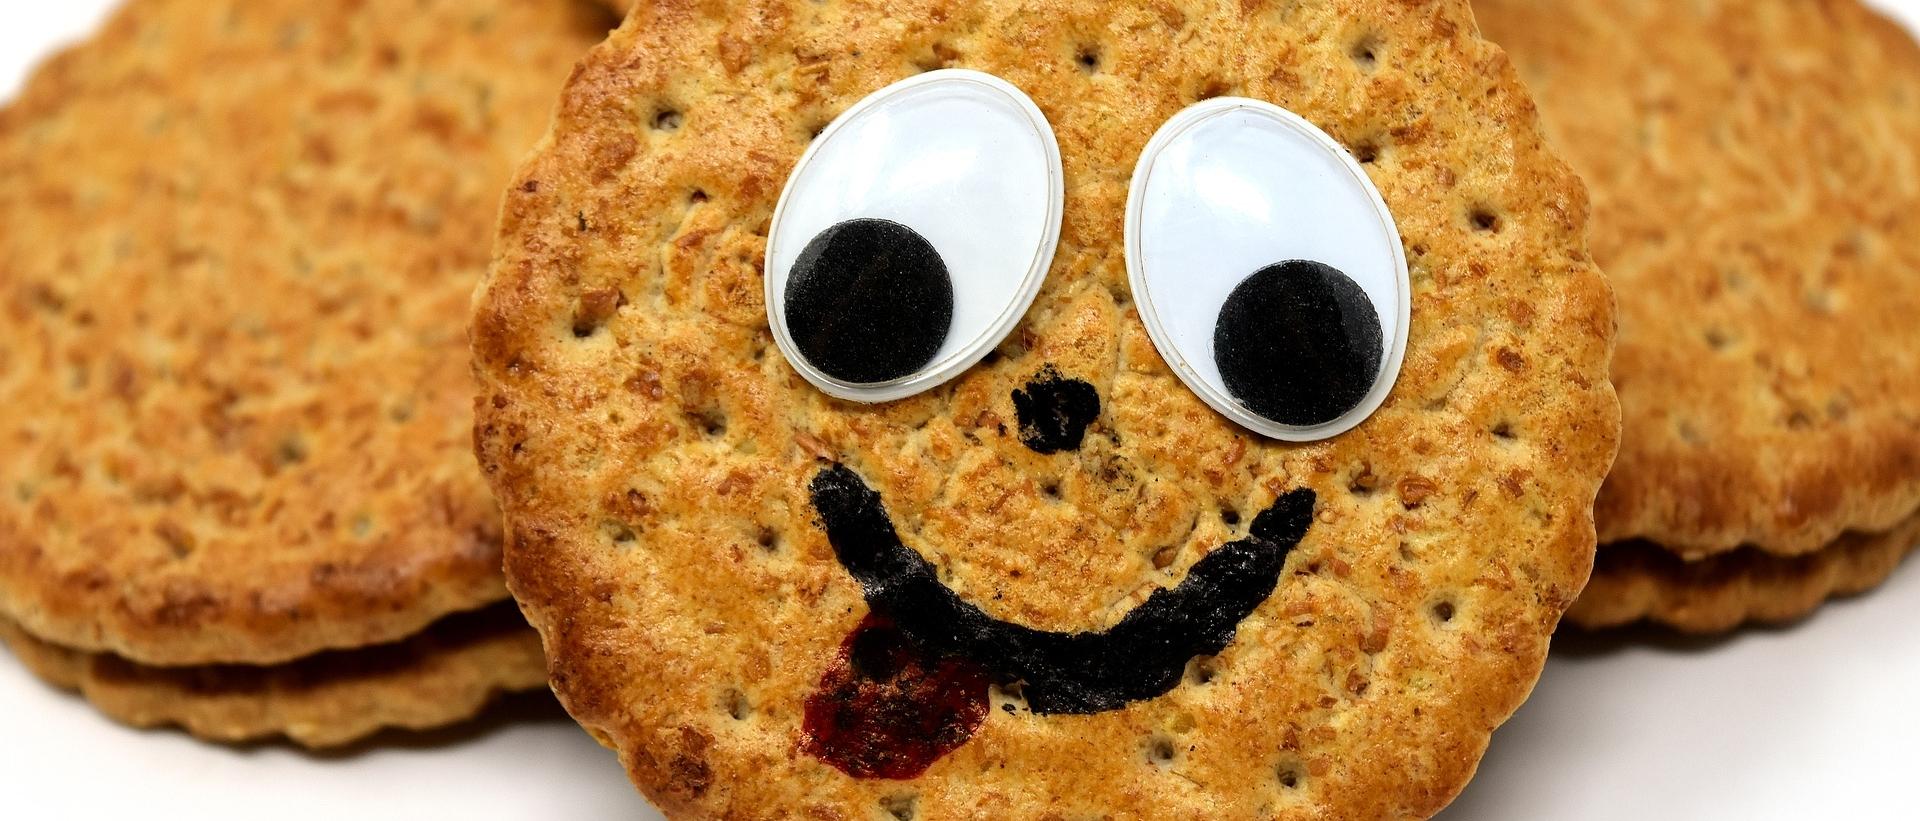 cookie smile joker-3114977_1920 pixabay.jpg